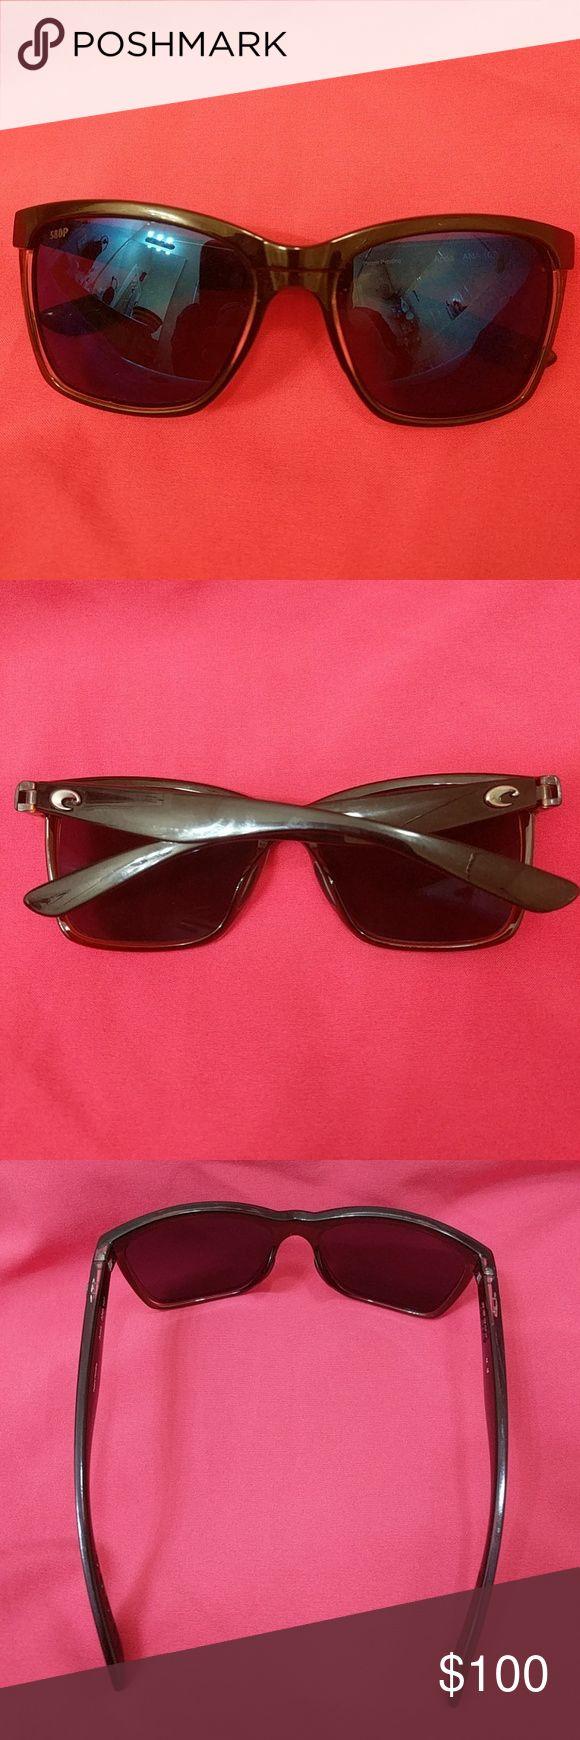 19 best Costa Sunglasses images on Pinterest   Costa sunglasses ...